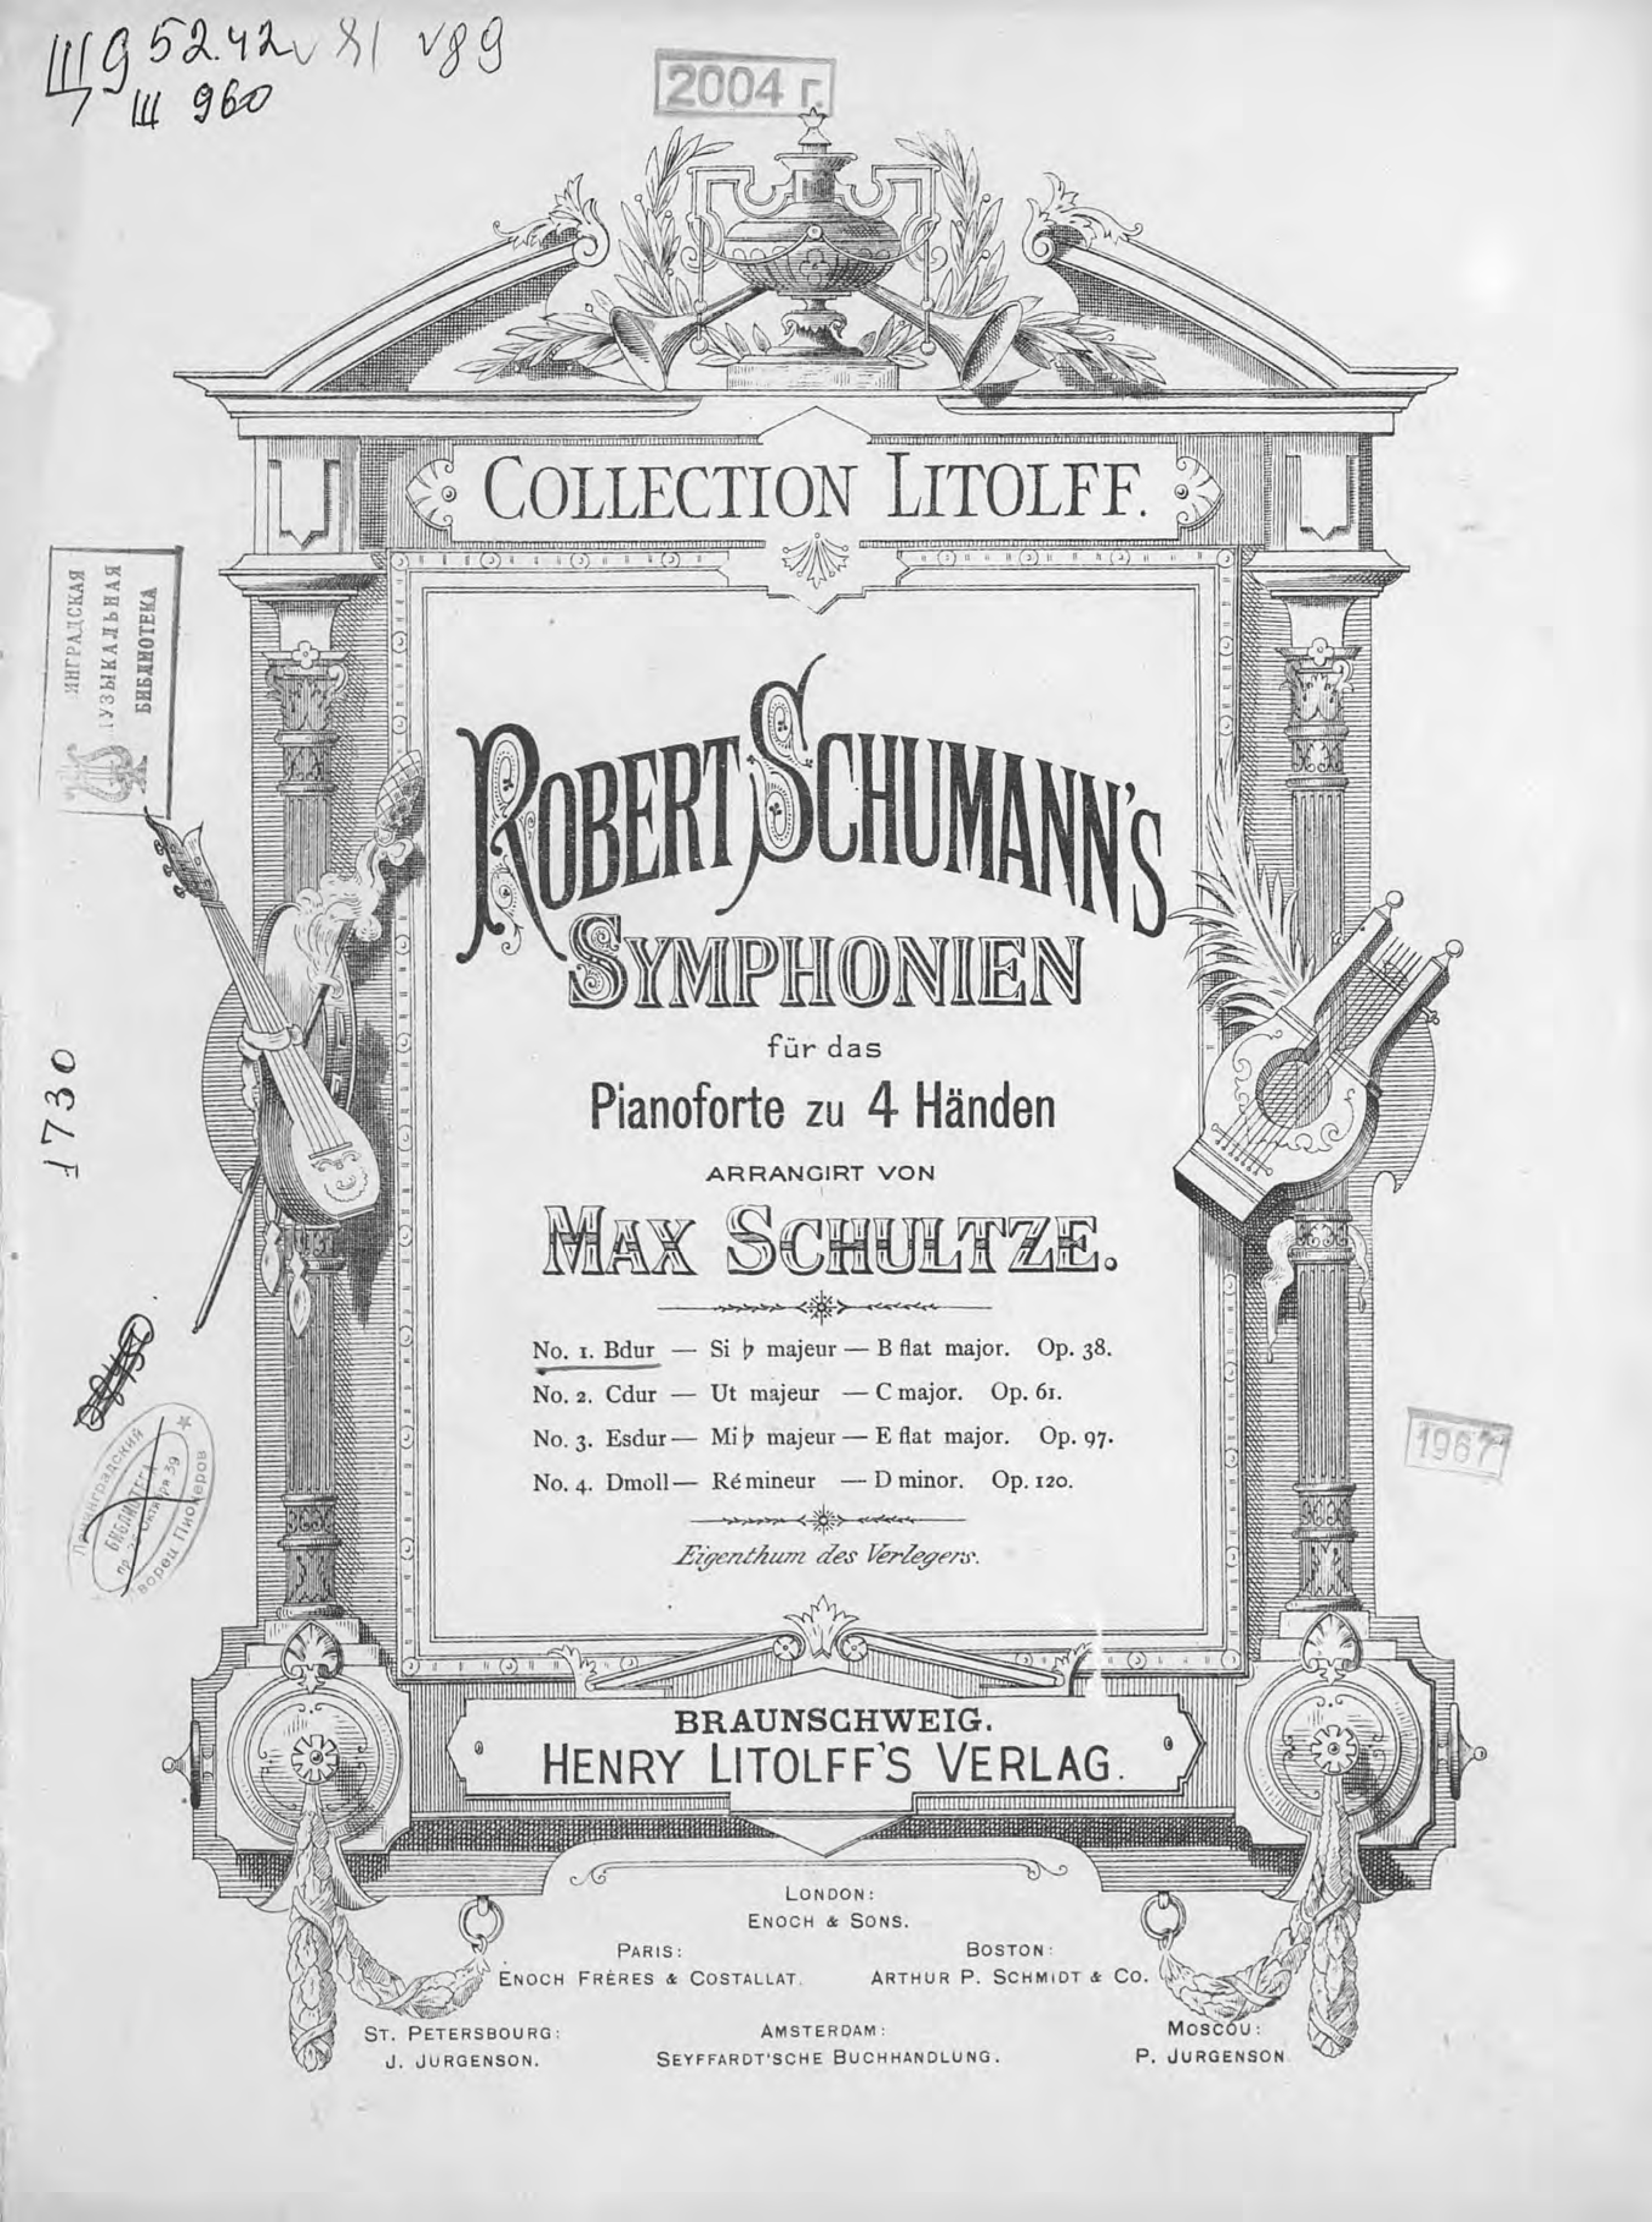 Роберт Шуман Symphonie № 1, B-dur (sib majeur) густав малер erste symphonie in d dur